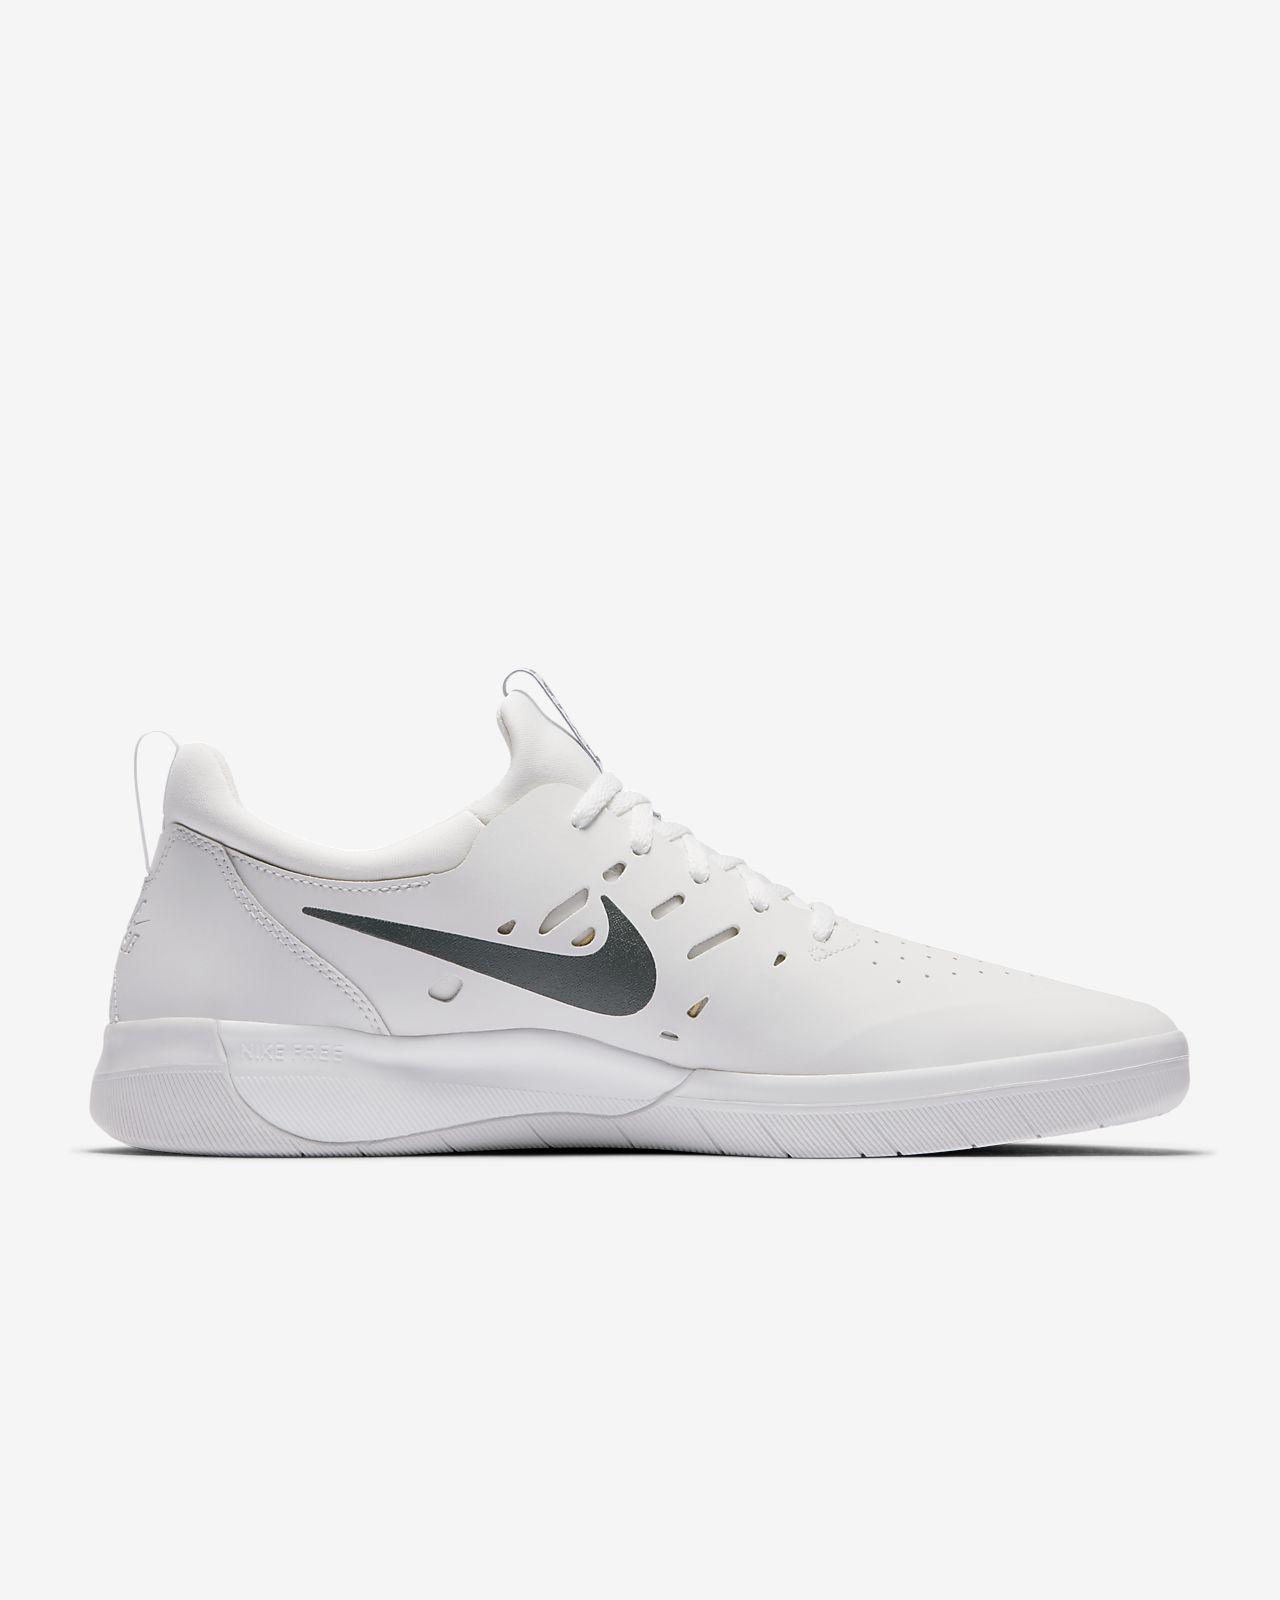 Fake Nike Air Huaraches on Groupon | Complex